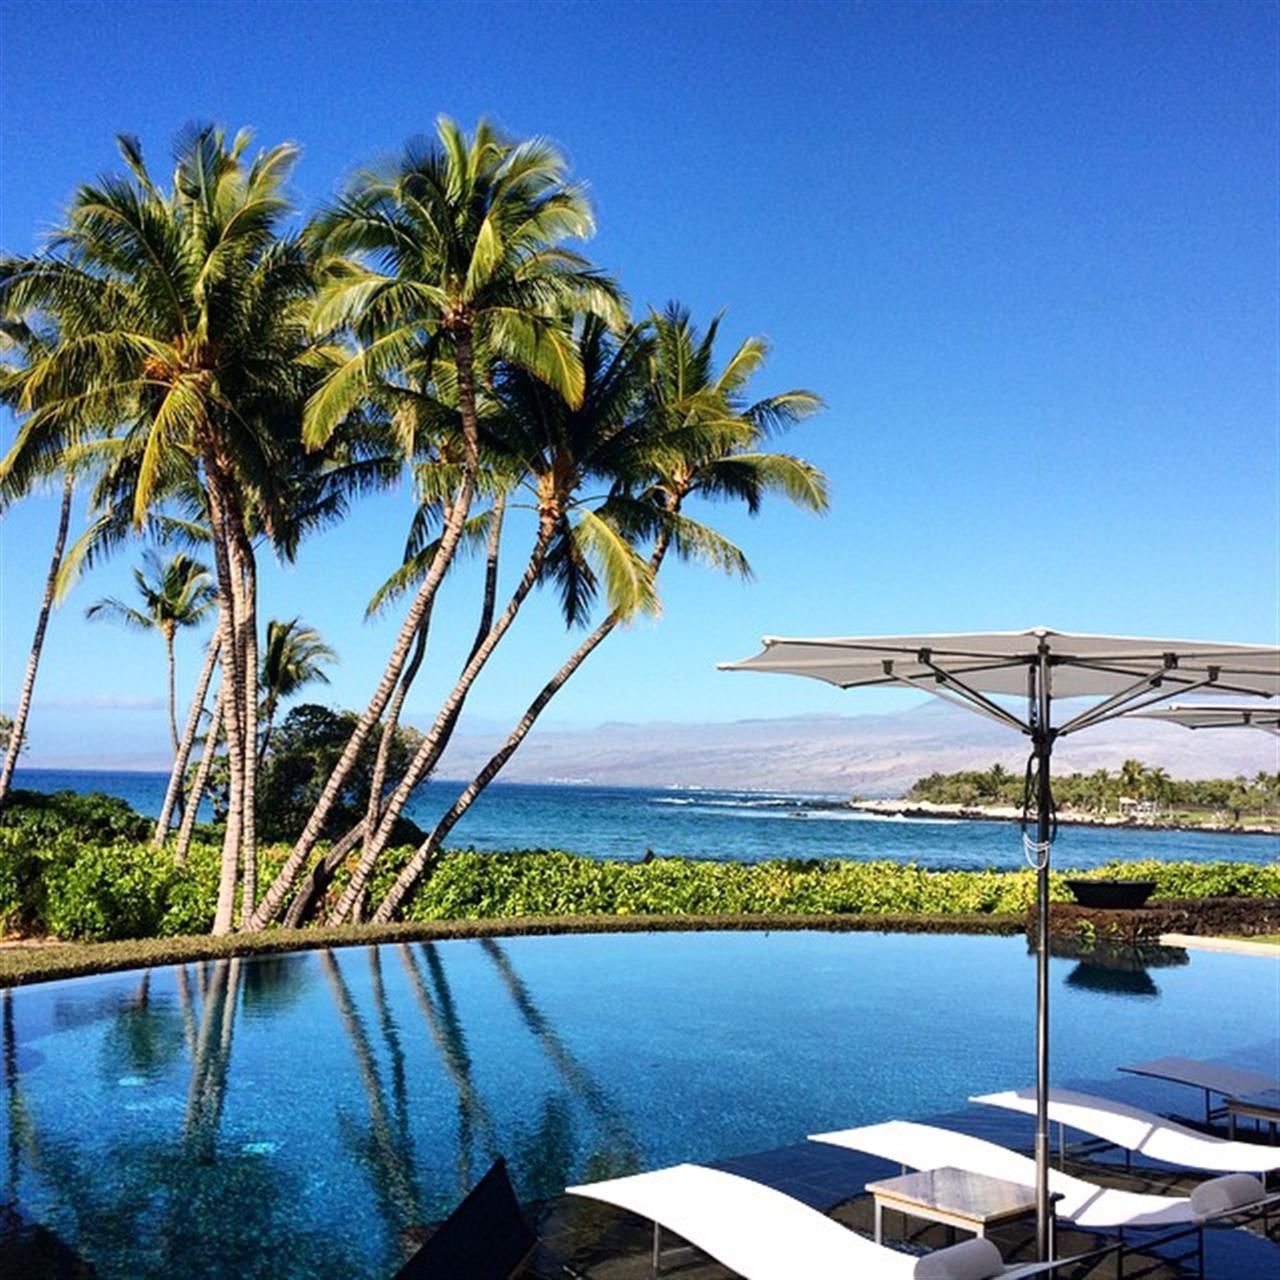 I just love Pauoa Beach! I mean this view is just unreal! #luckywelivehawaii #beingbrooke #glimpseofhawaii #wearehawaii #hawaiistagram #HawaiiLife #instahub #pauoabeach #maunalani #kohalacoast #leadingRElocal